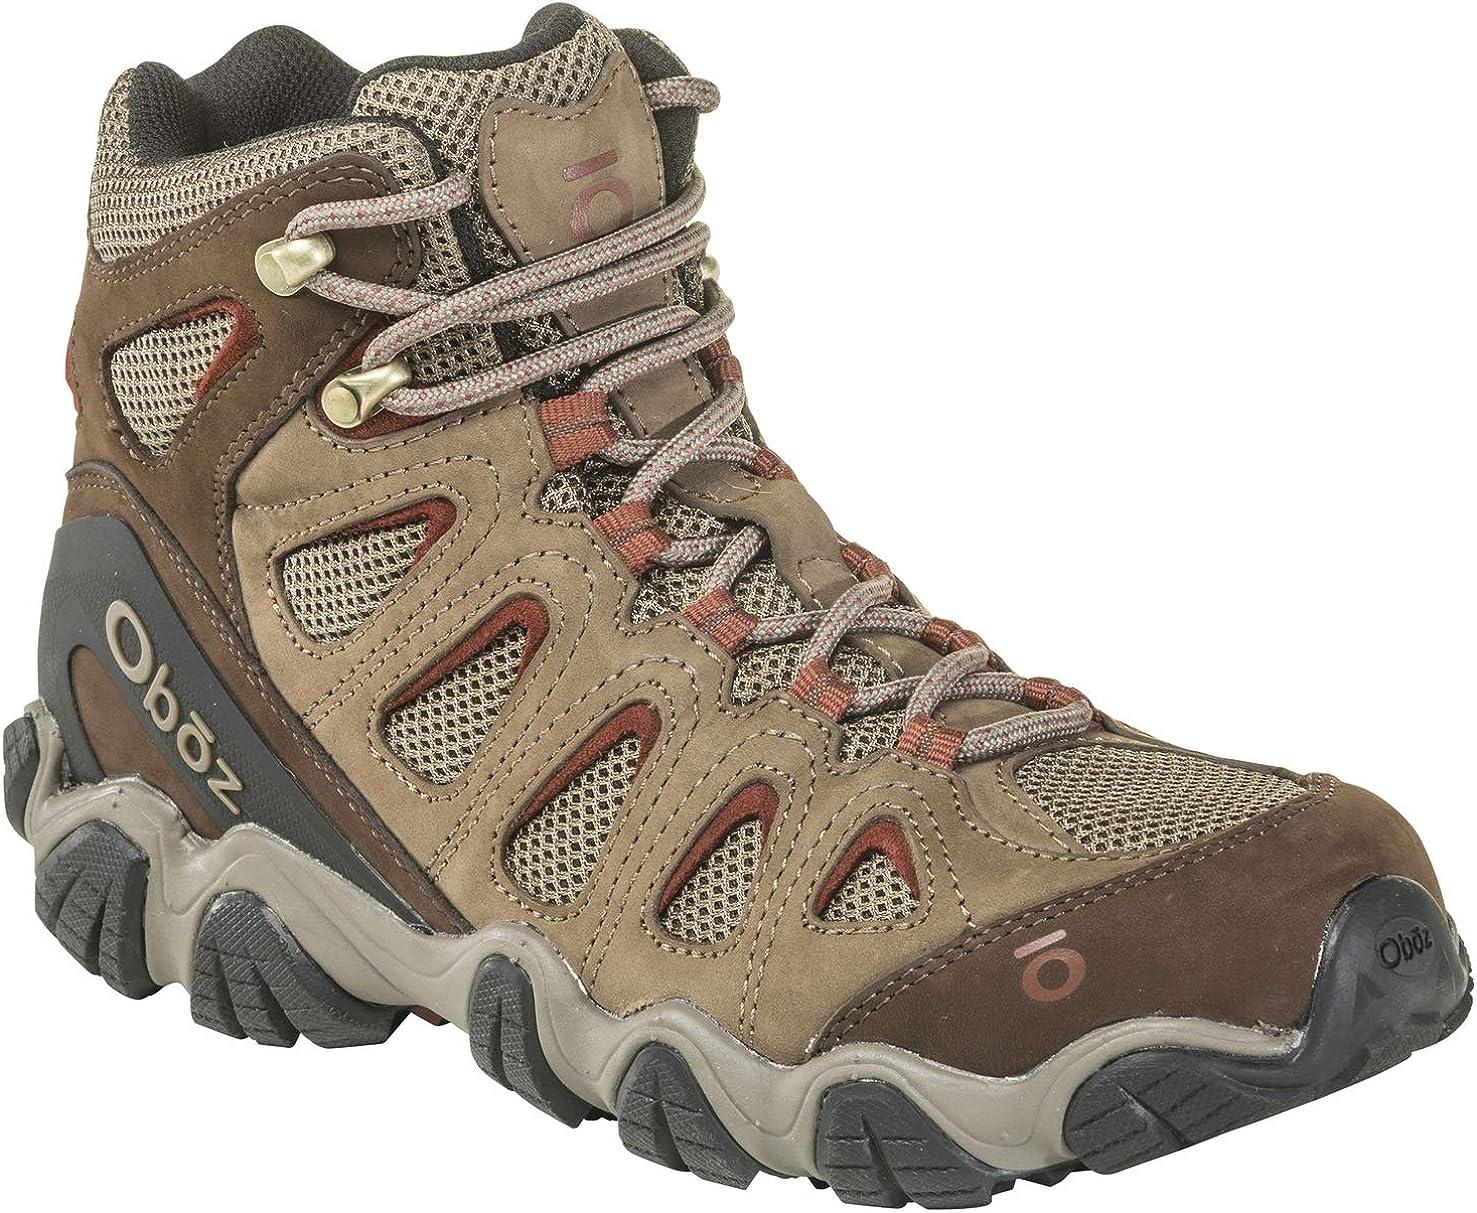 Oboz Men's Sawtooth II Mid Hiking Boot